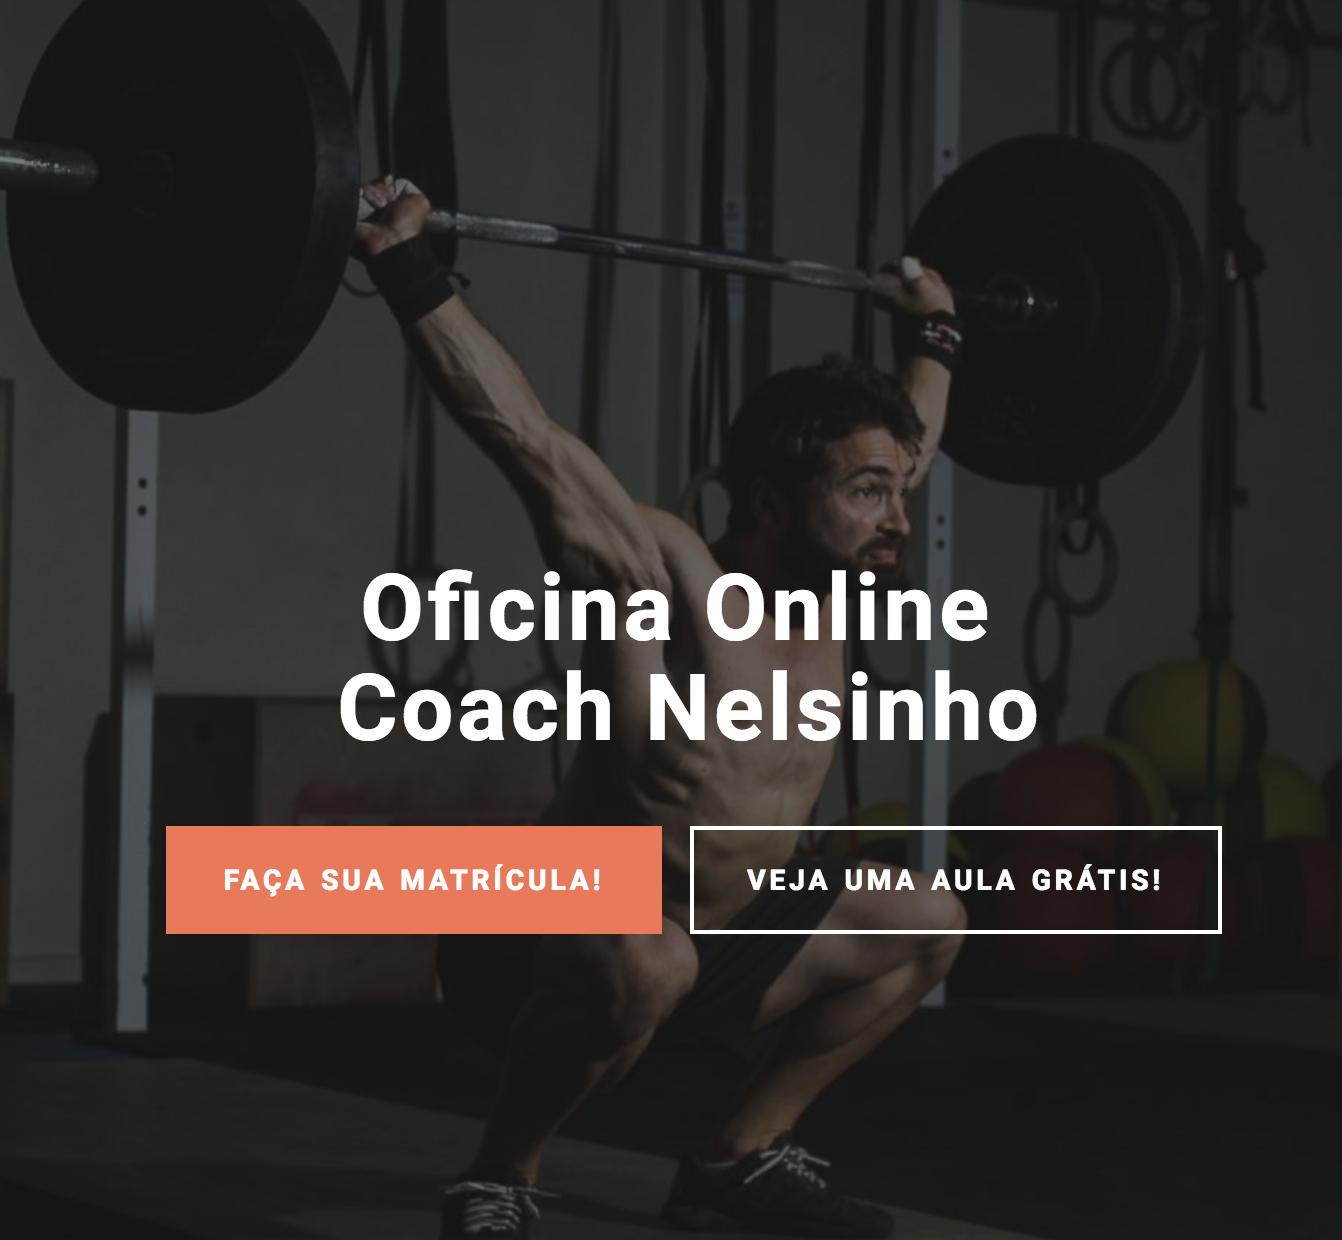 Oficina Coach Nelsinho